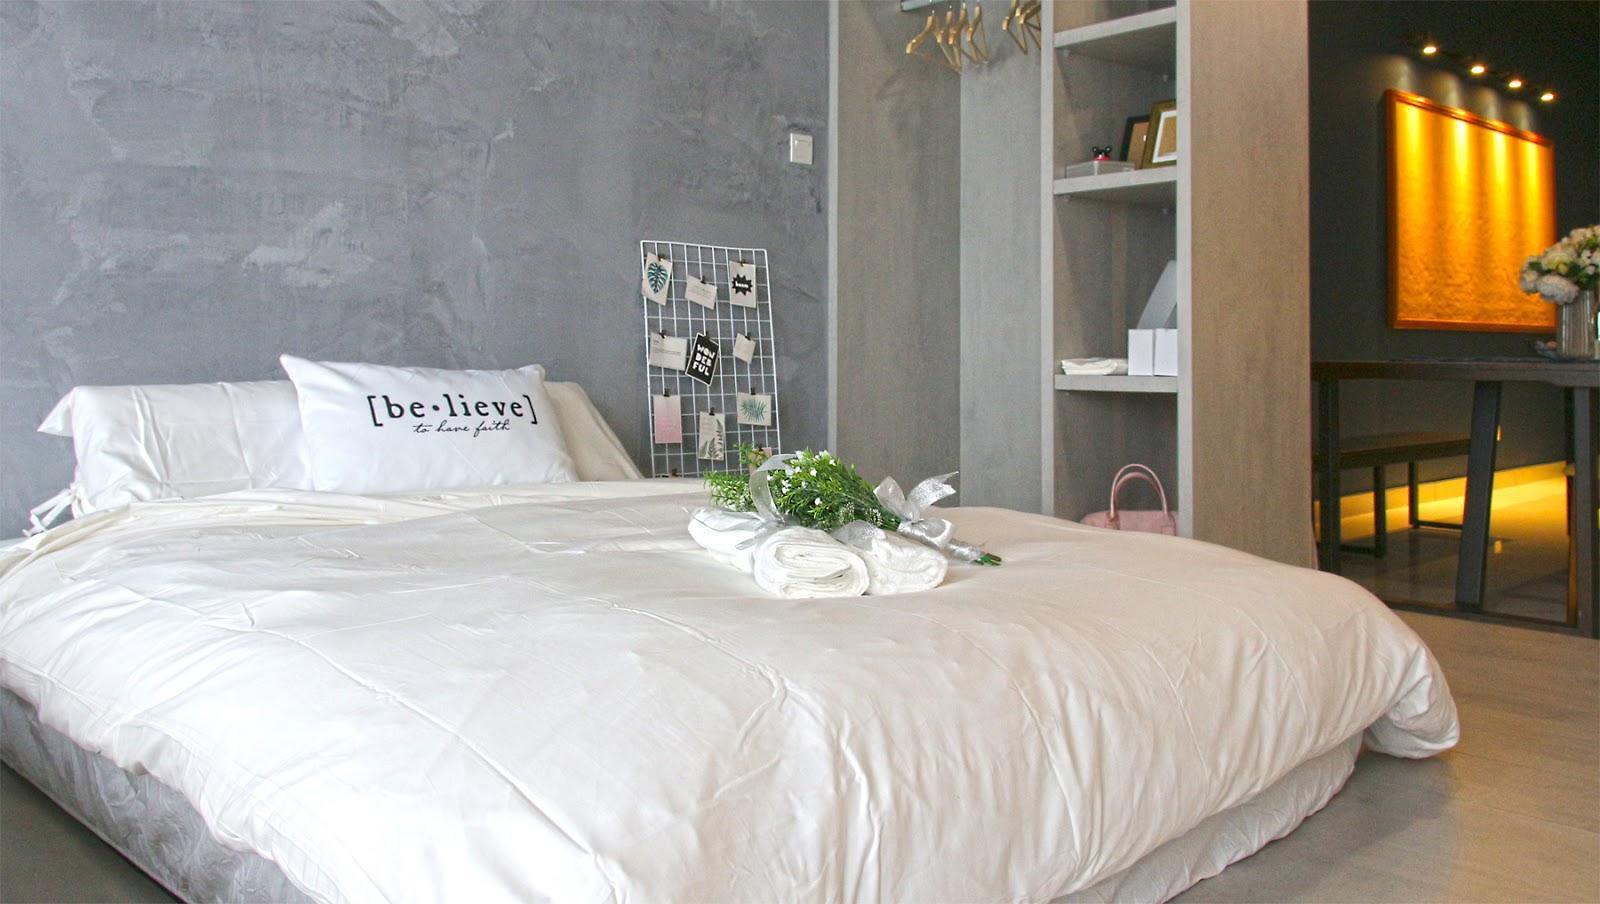 Katil saiz queen atas platform jenis terangkat yang boleh dialihkan untuk menambah lagi satu katil